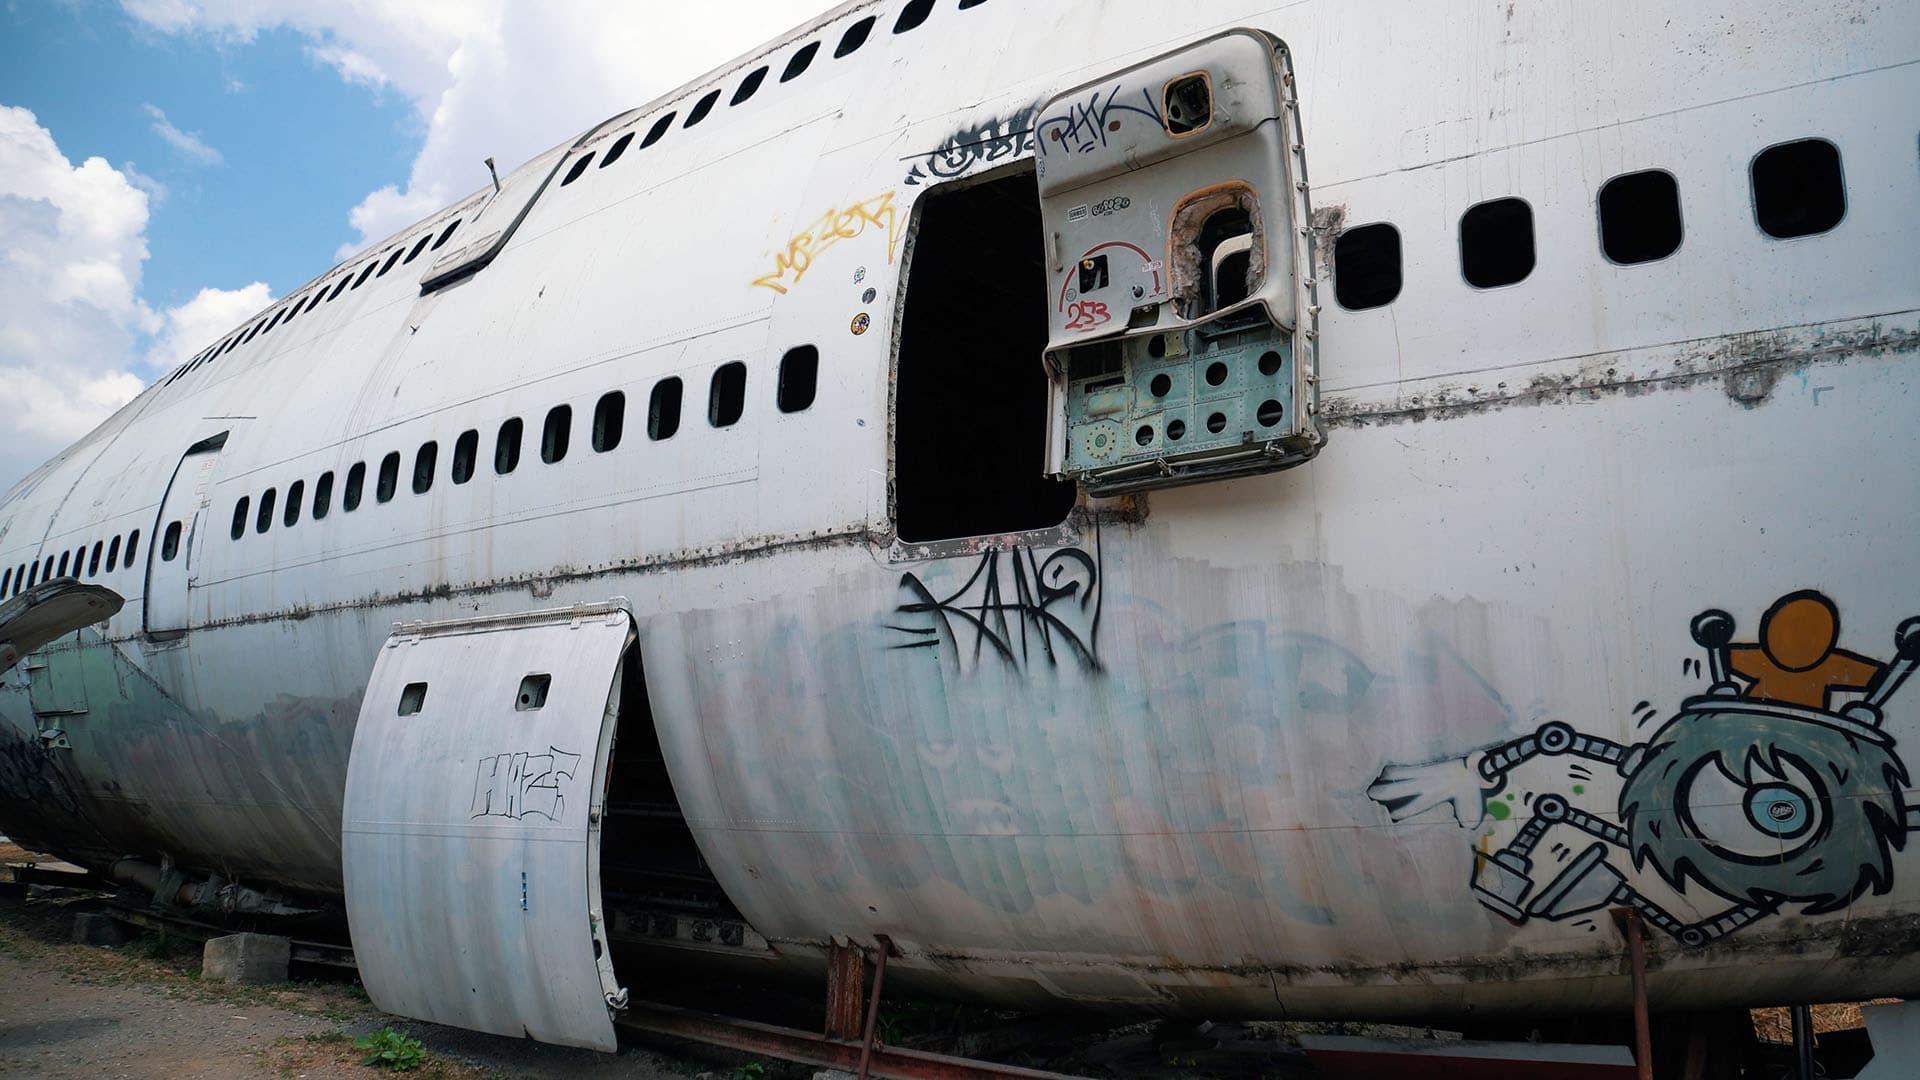 Boeing 747 am Flugzeugfriedhof in Bangkok